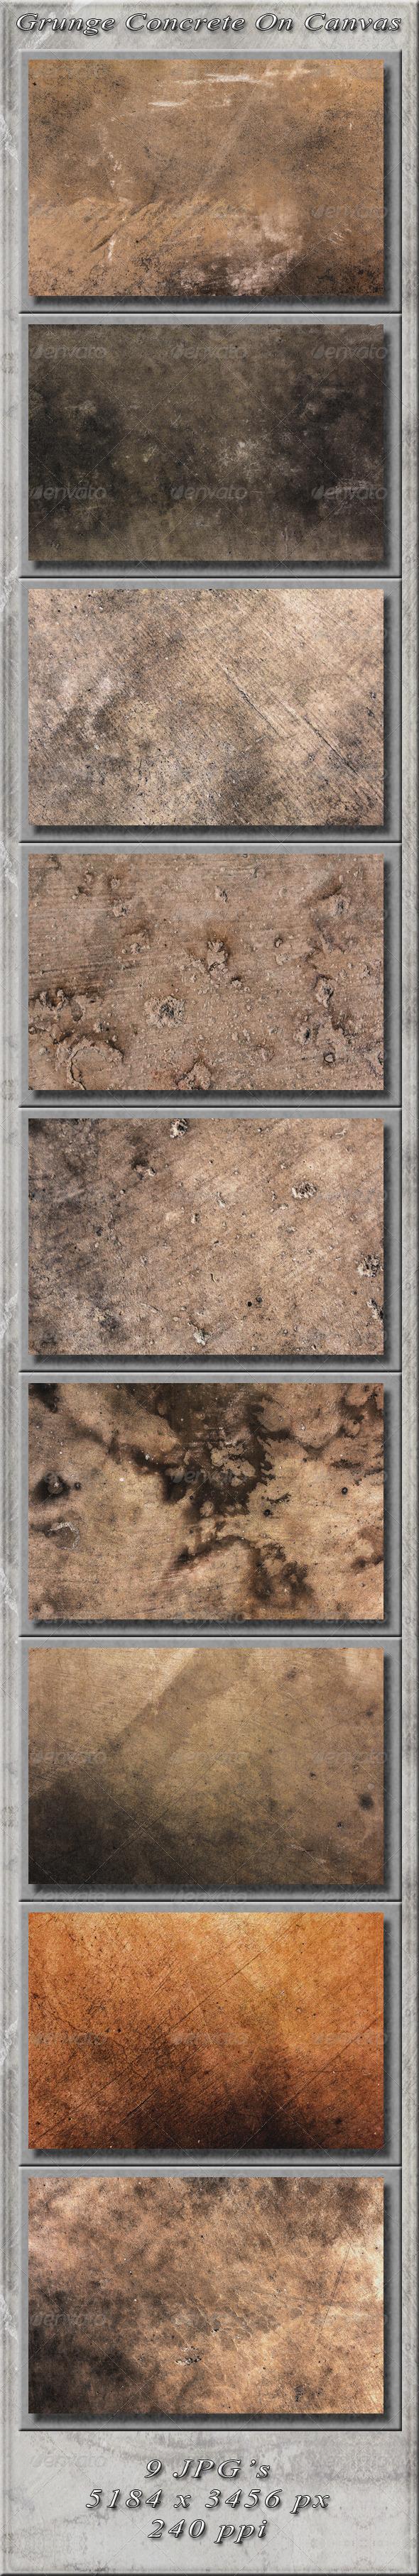 GraphicRiver Grunge Concrete On Canvas 5009705